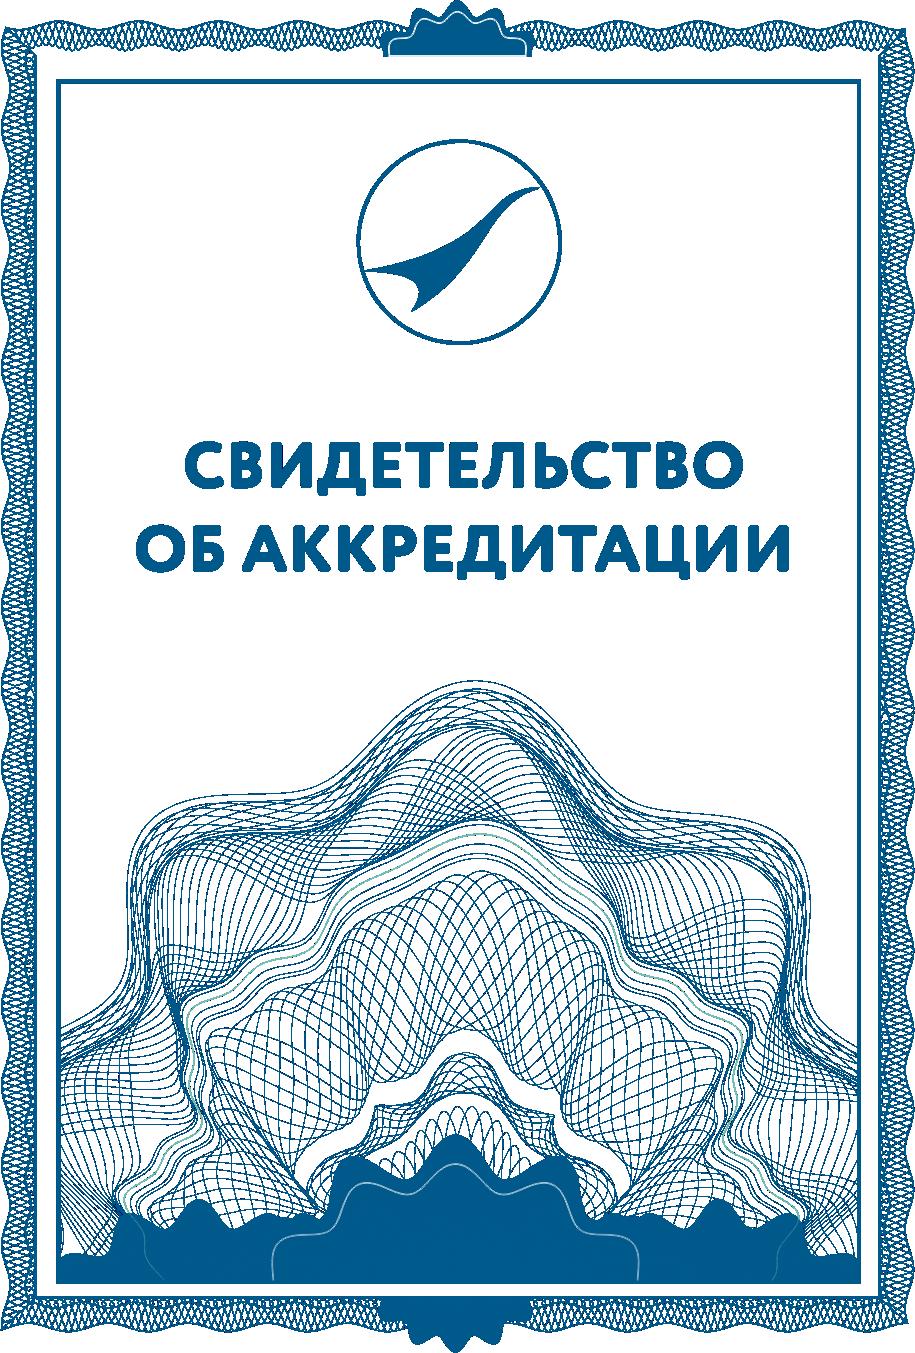 svidetelstvo ob akkreditacii IPB Rossii